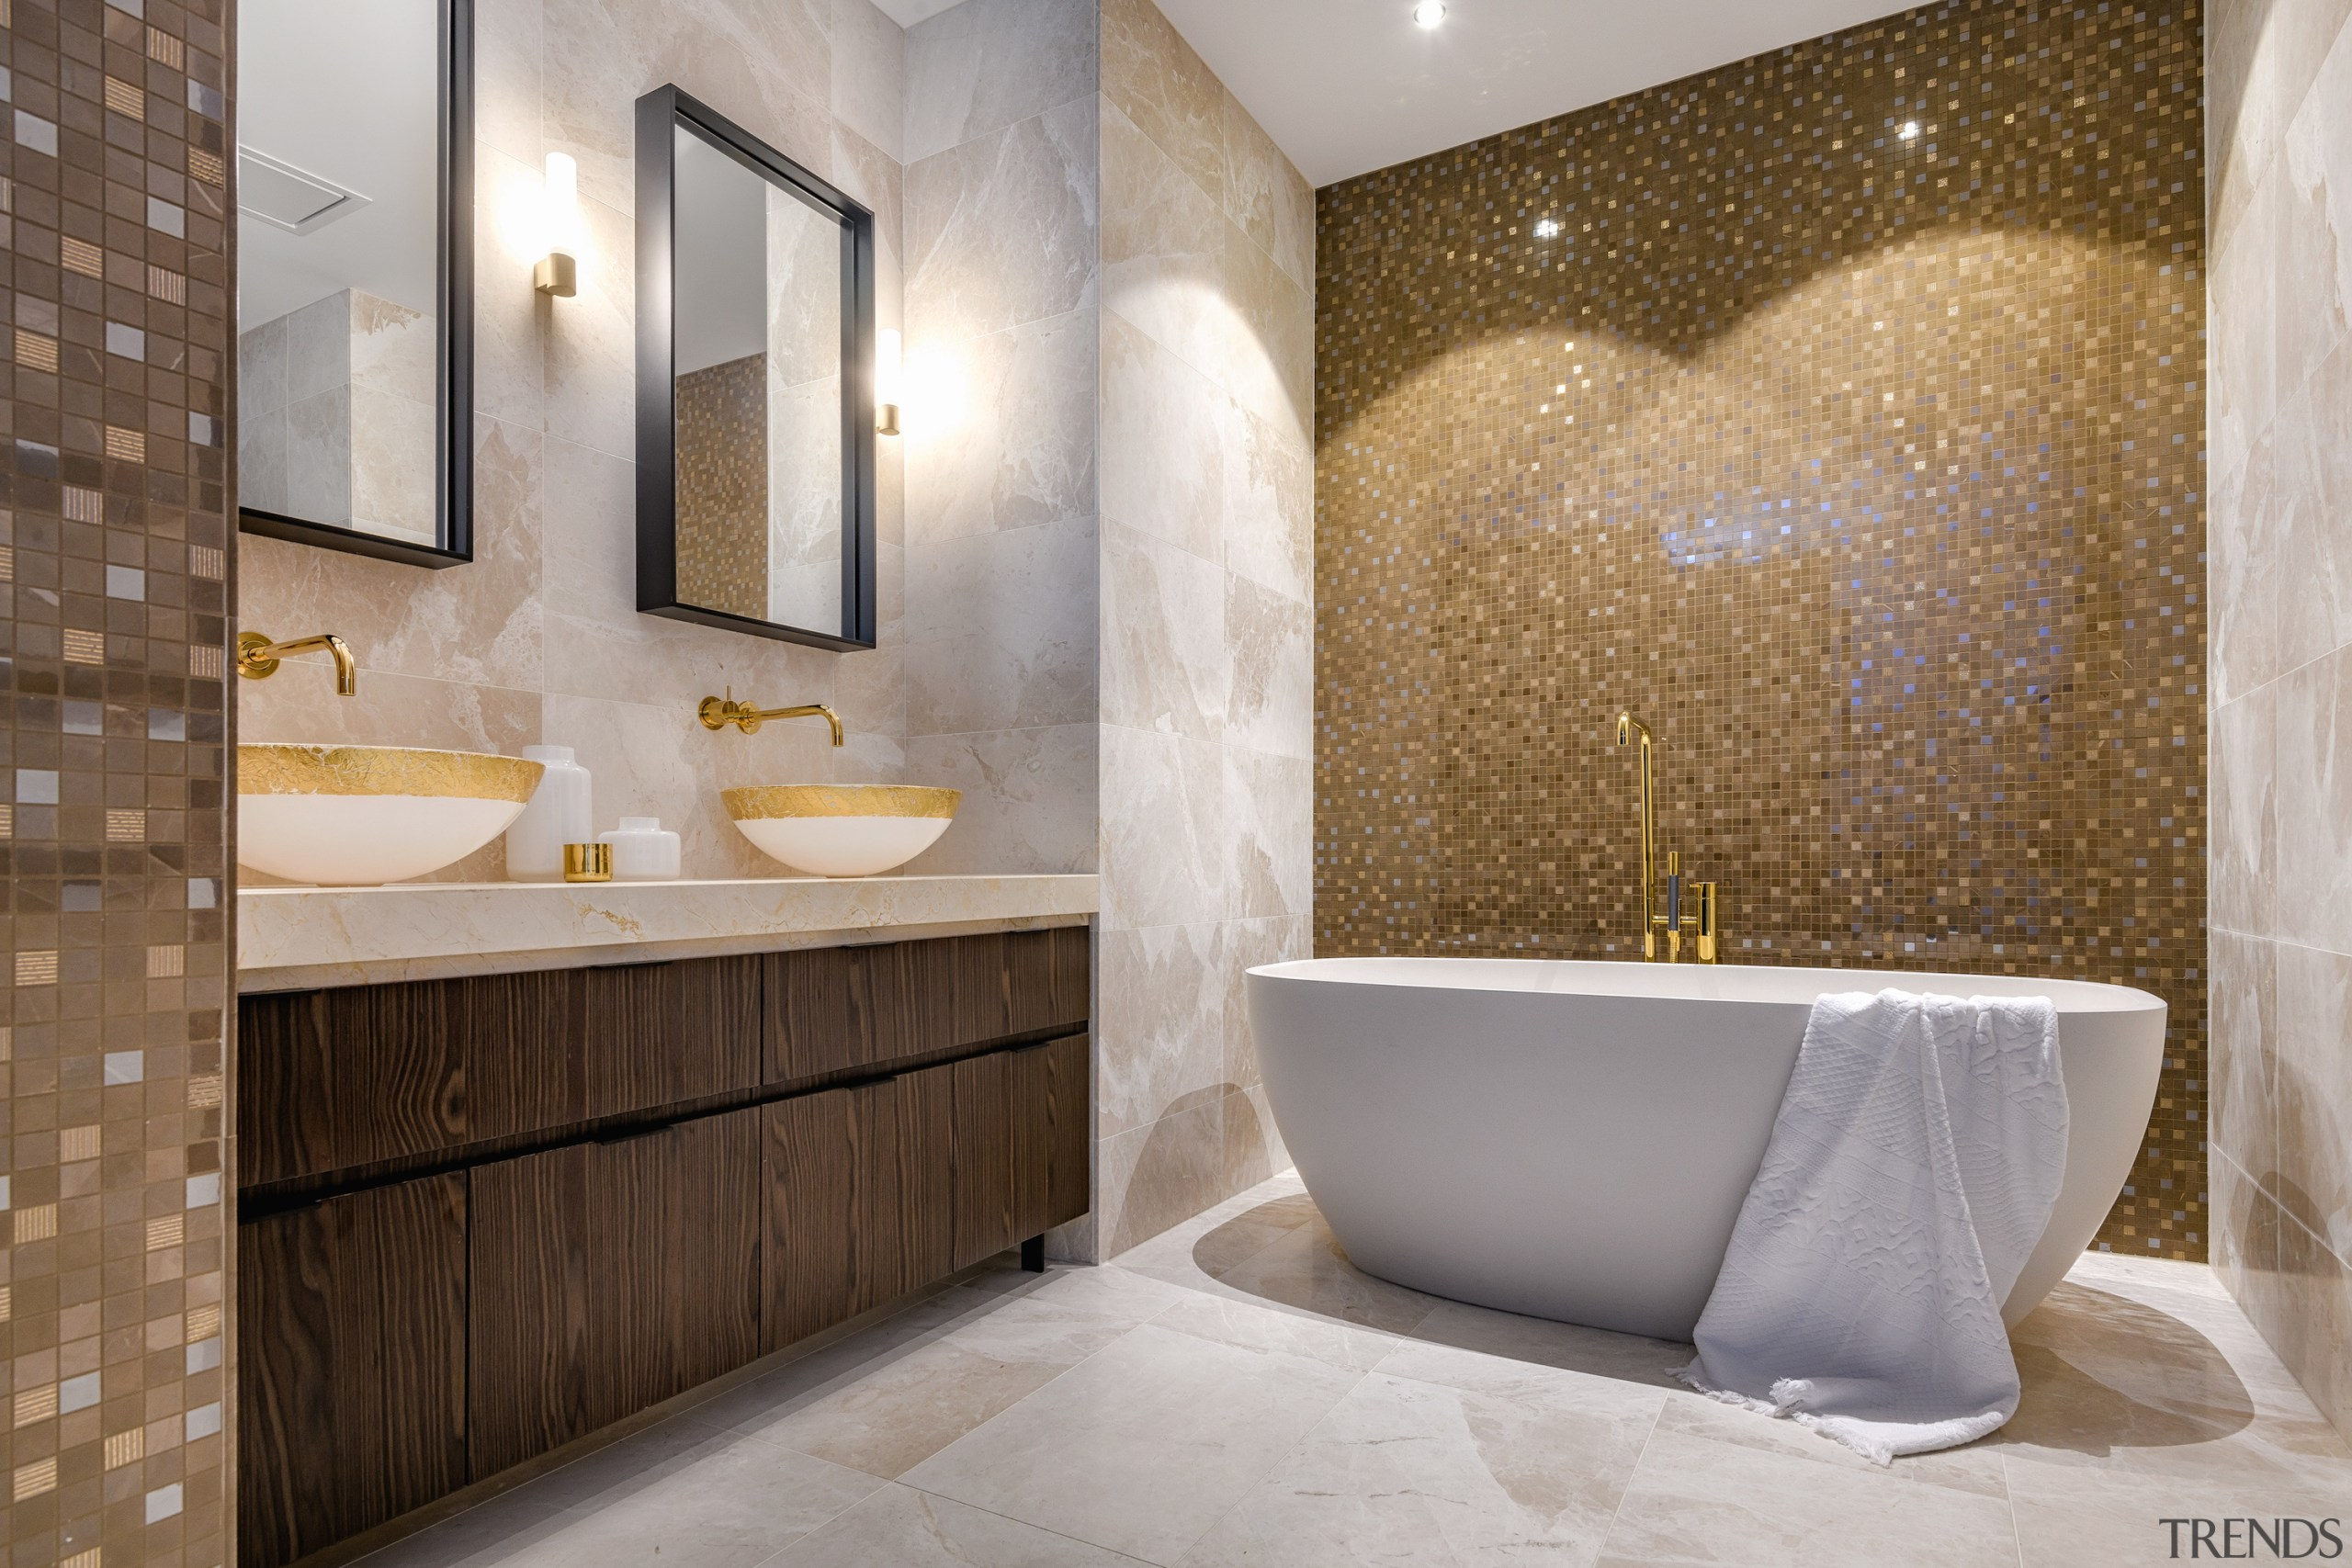 Detail by Davinia Sutton – Winner – 2019 architecture, bathroom, bathtub, building, ceiling, ceramic, floor, flooring, interior design, limestone, marble, plumbing fixture, property, room, tap, tile, wall, gray, brown